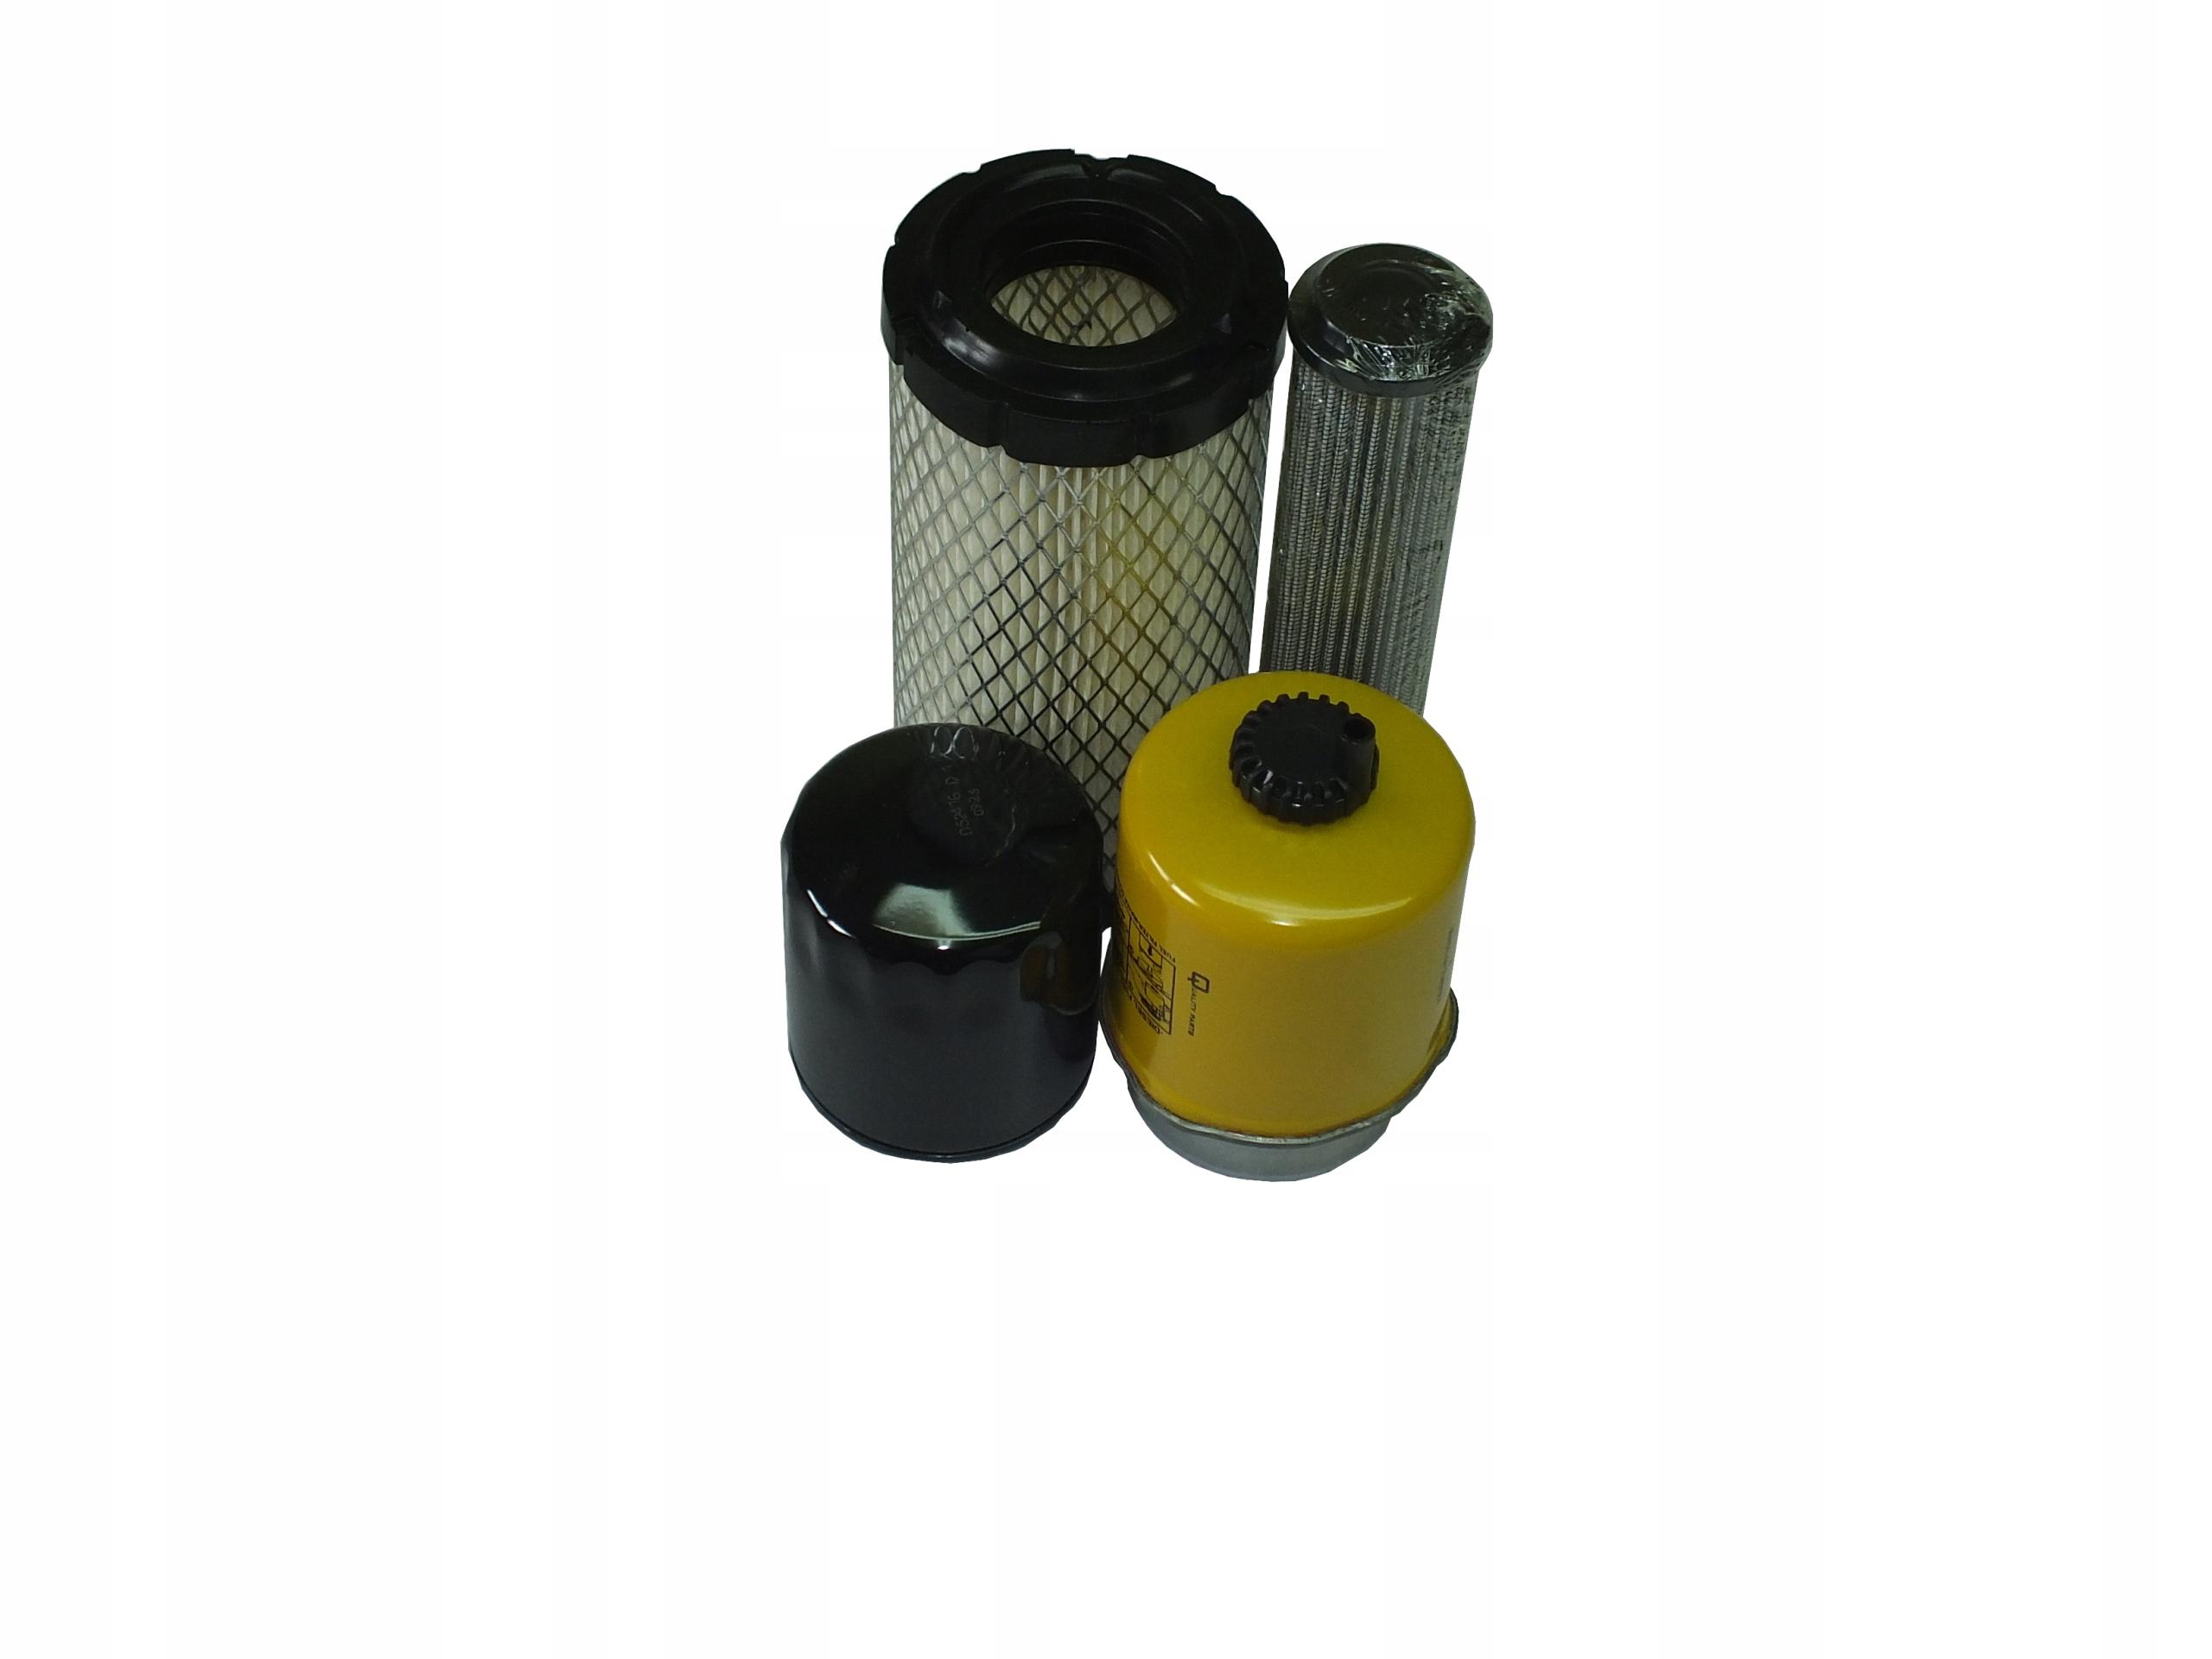 Filtry zestaw mini JCB 8014,8015,8016,8017,8018.